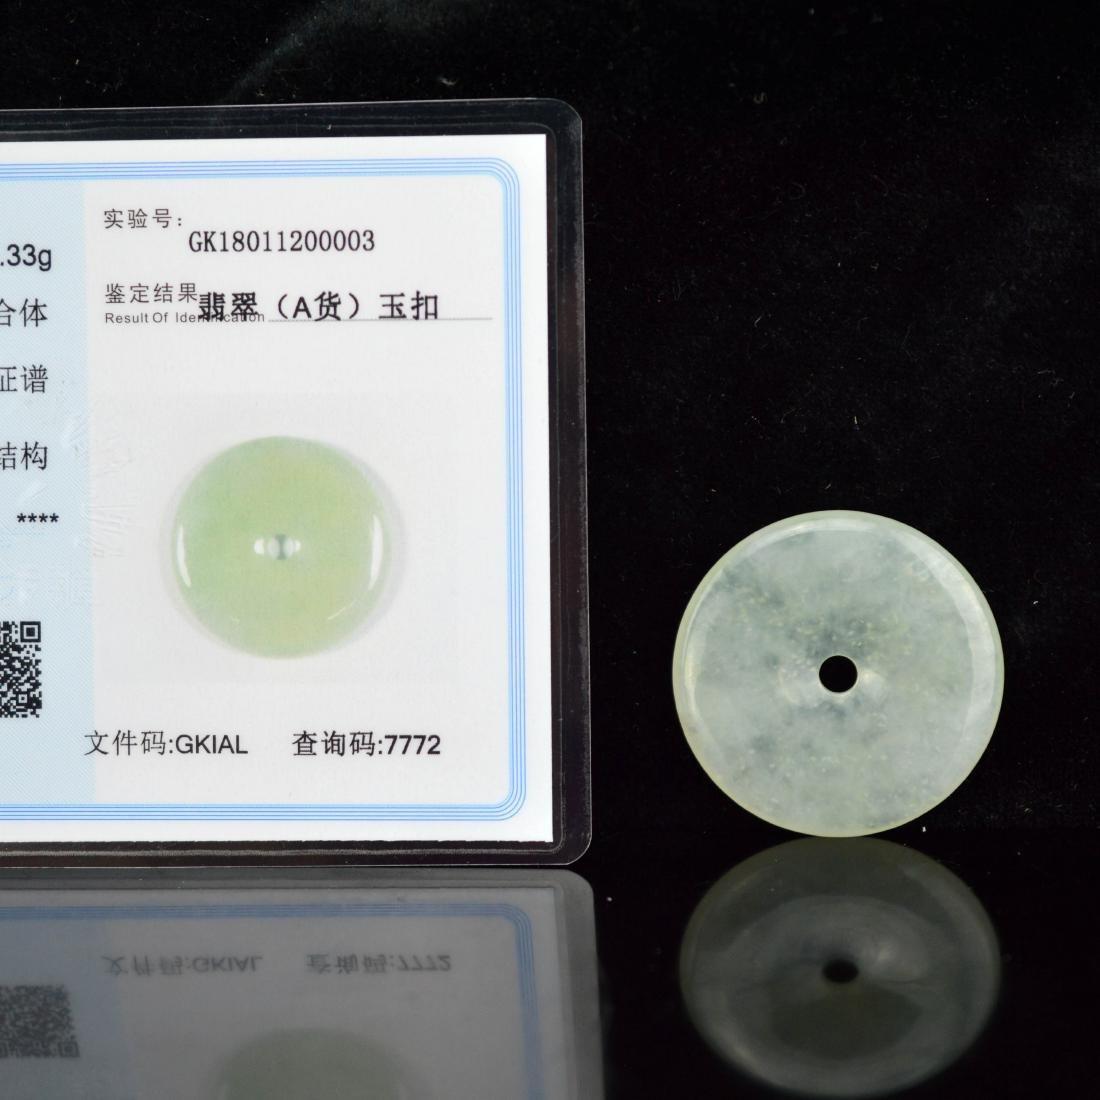 Certified Icy jadeite disk pendant